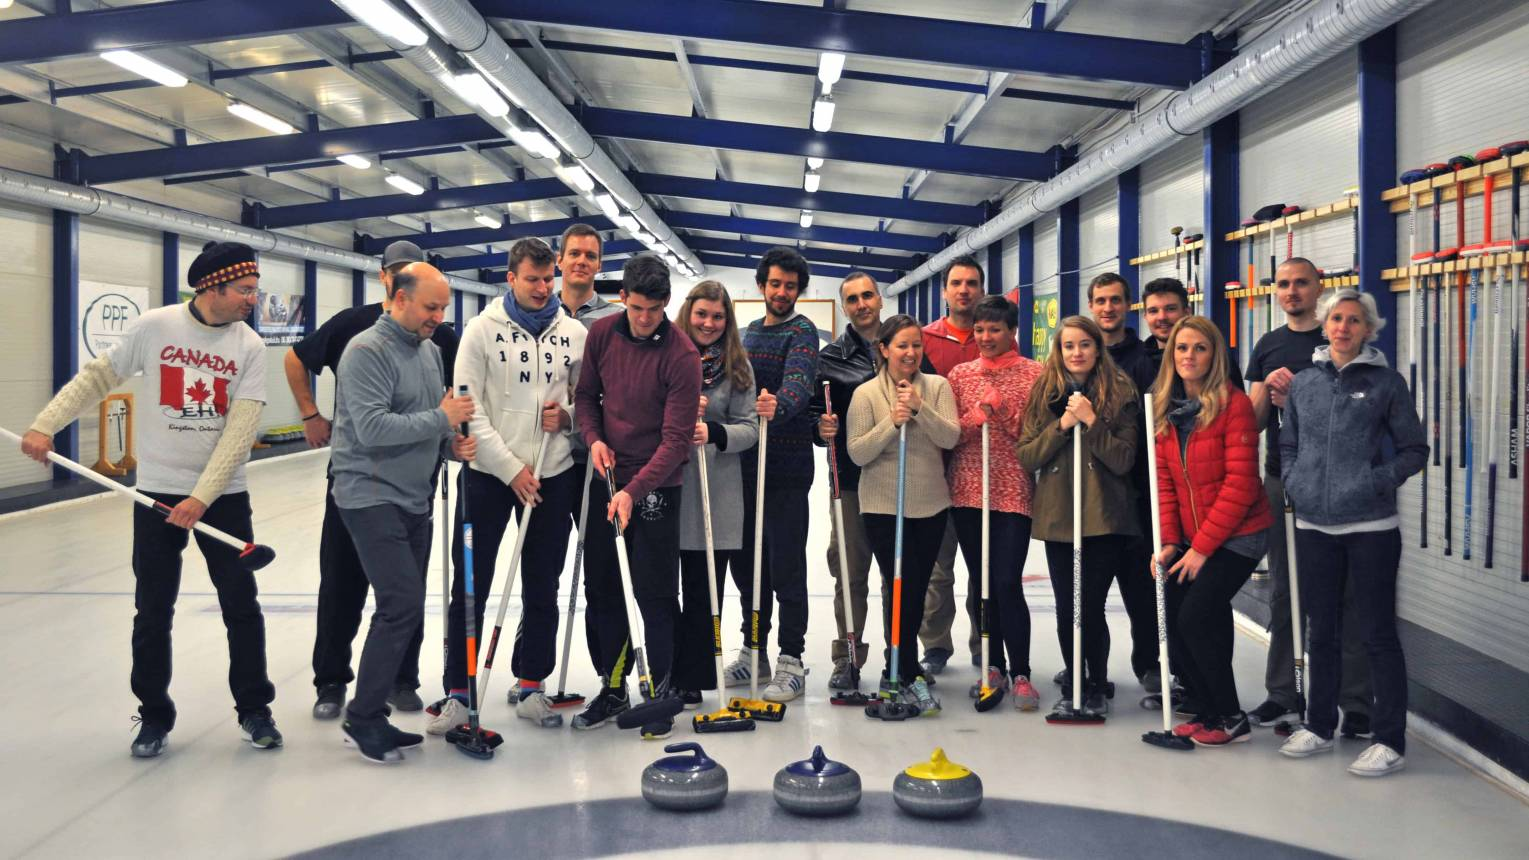 Curling 8 fő részére 1 pálya